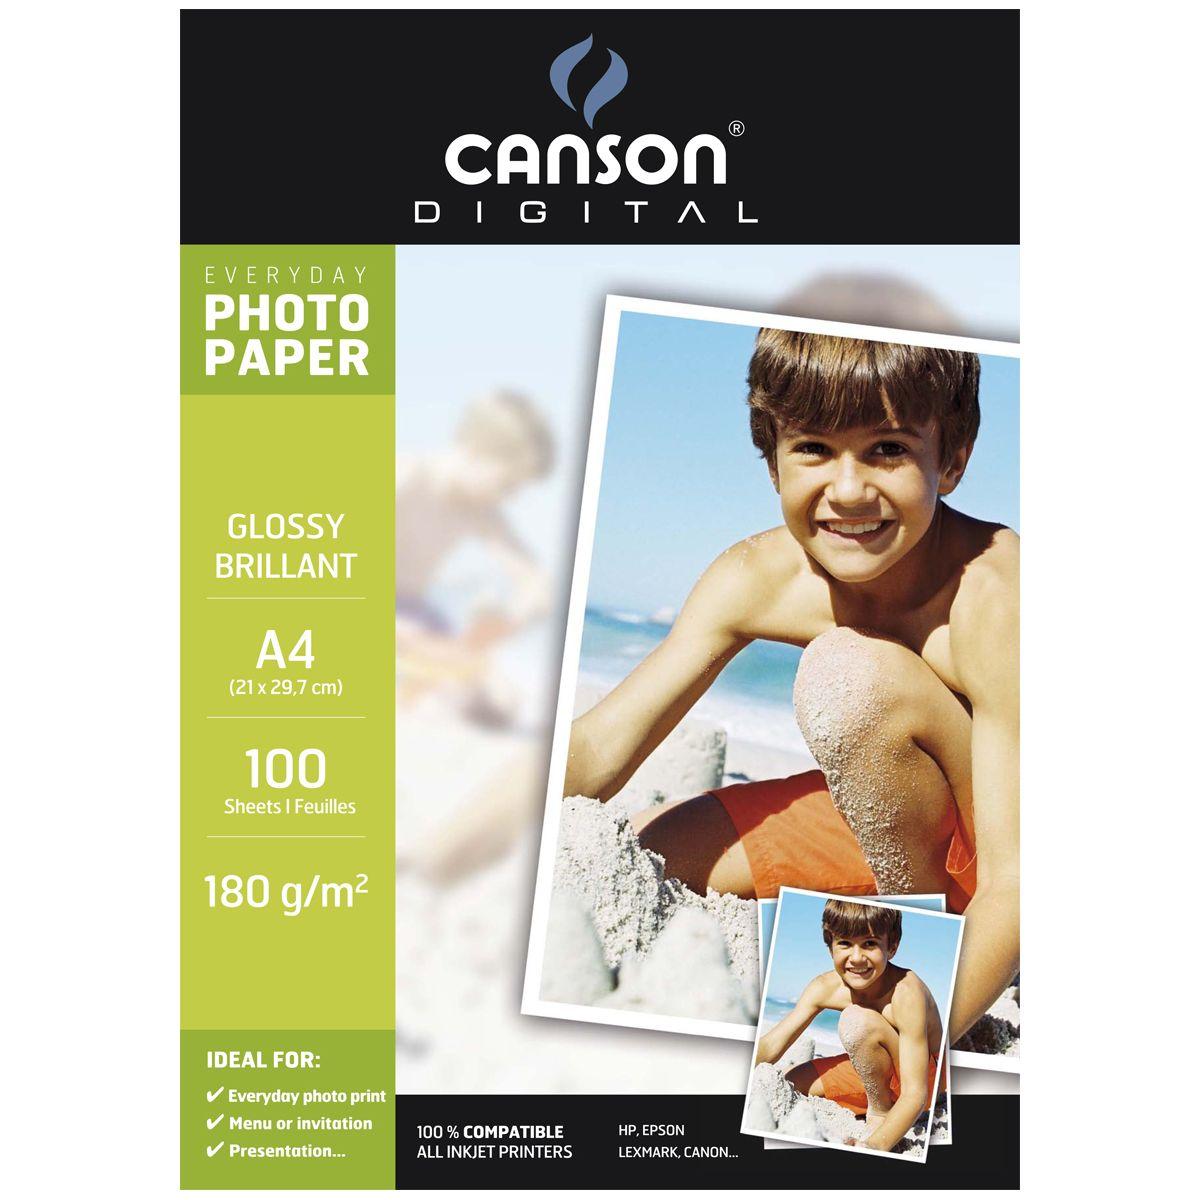 Papier photo canson 100 feuilles everyday a4 180g brillant (photo)